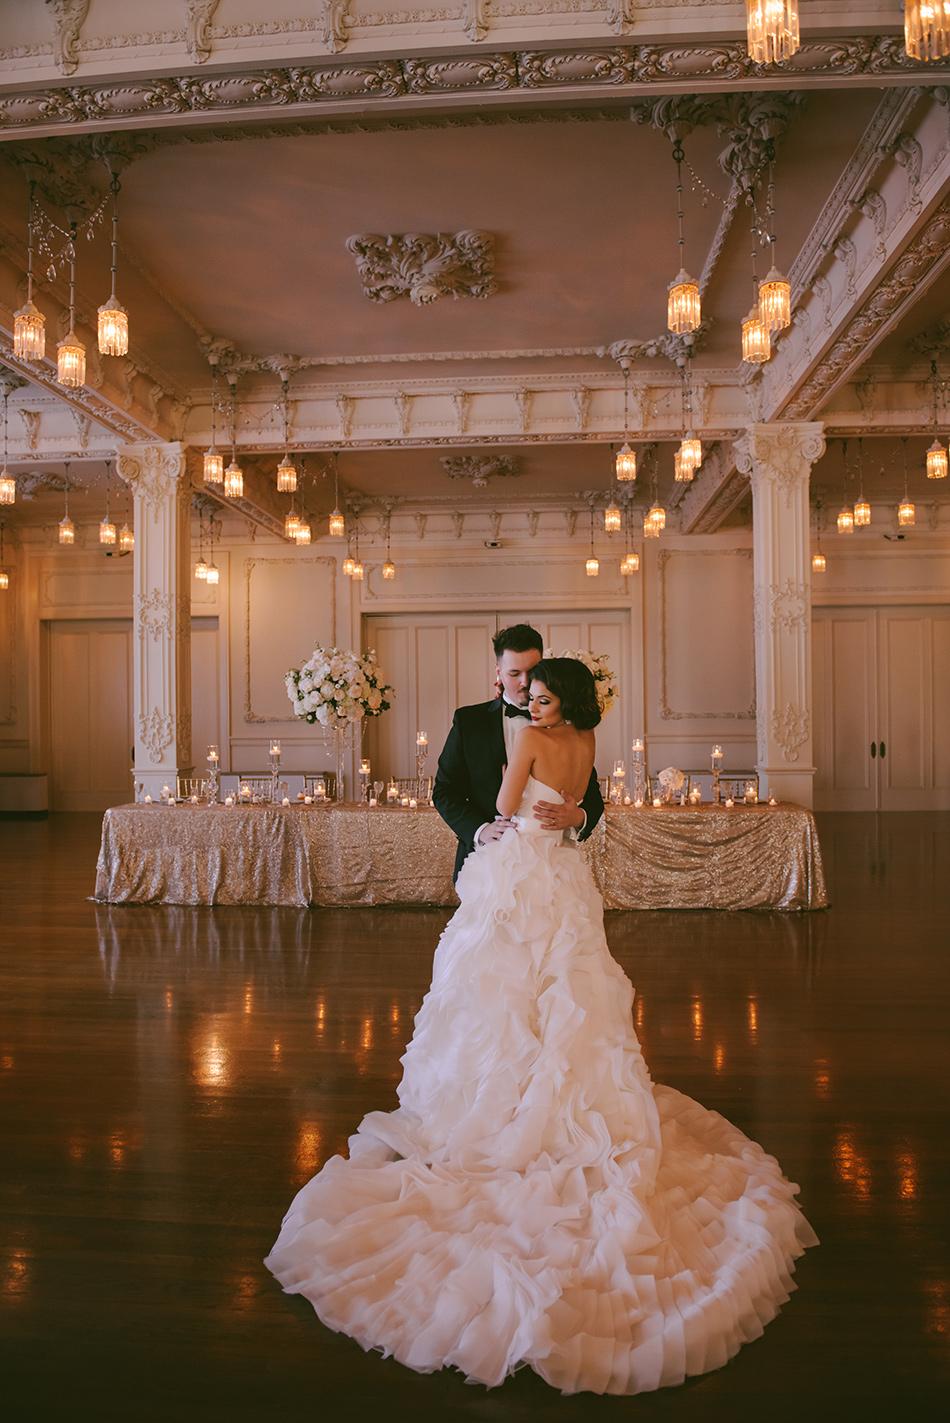 AD Passion Photography | stephany-and-nathan-wedding-dallas_201 | Adelin, Dida, fotograf profesionist, fotograf de nunta, fotografie de nunta, fotograf Timisoara, fotograf Craiova, fotograf Bucuresti, fotograf Arad, nunta Timisoara, nunta Arad, nunta Bucuresti, nunta Craiova